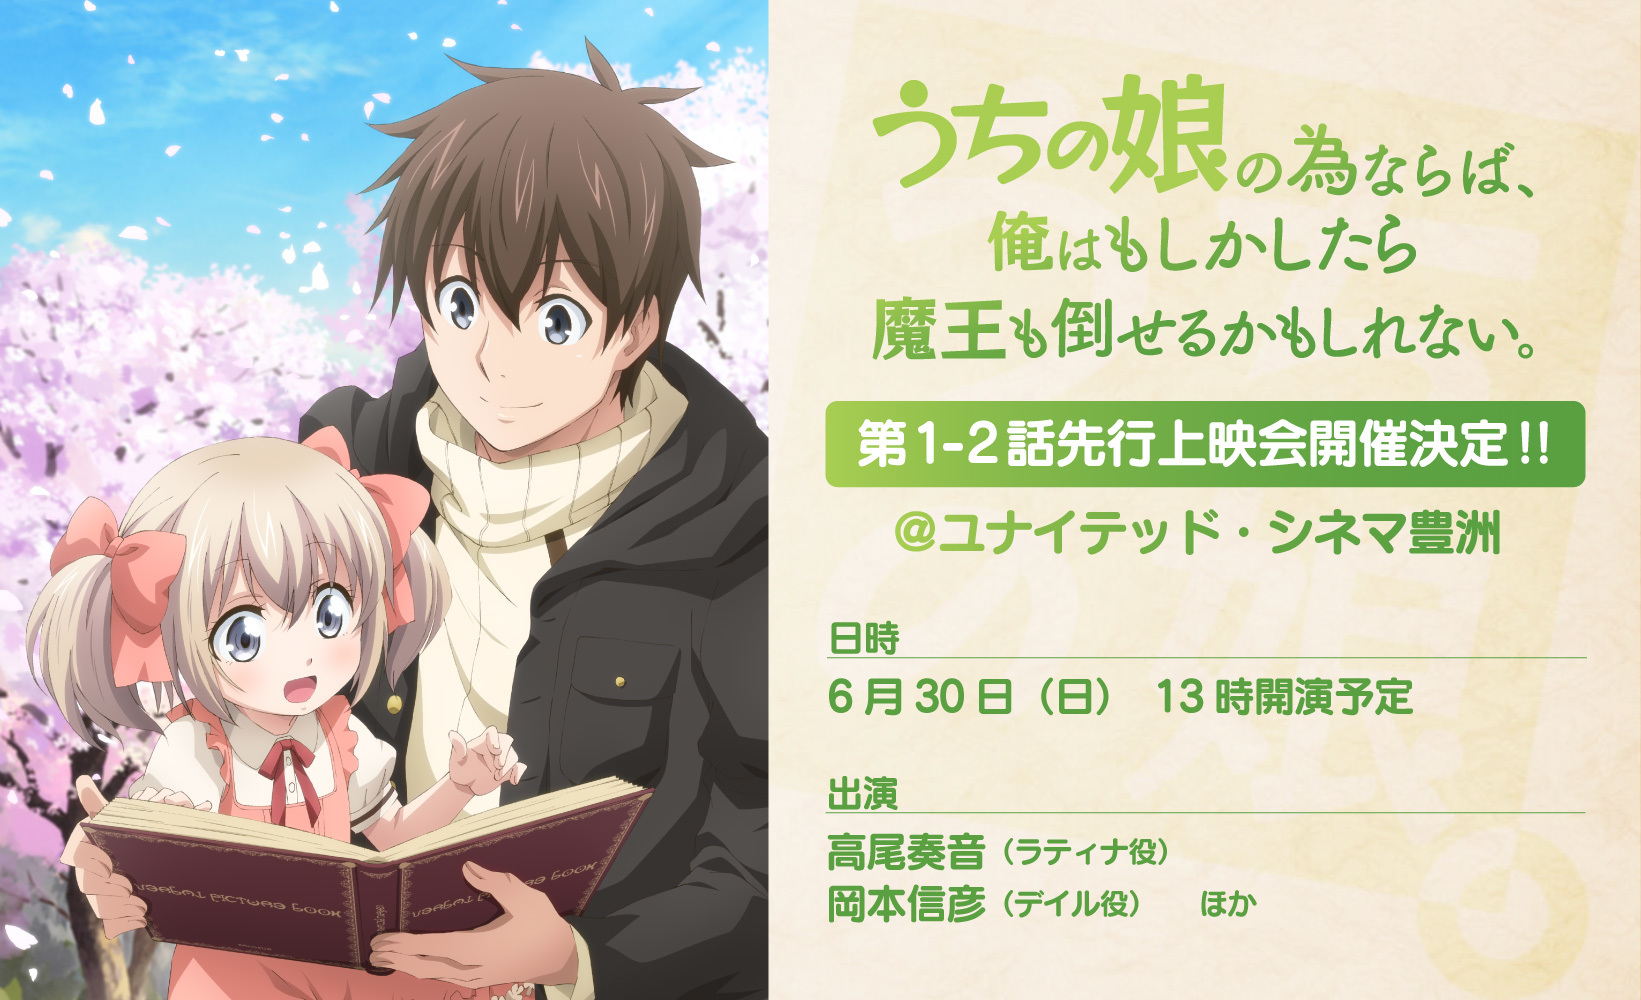 (c)CHIROLU・ホビージャパン/白金の妖精姫を見守る会